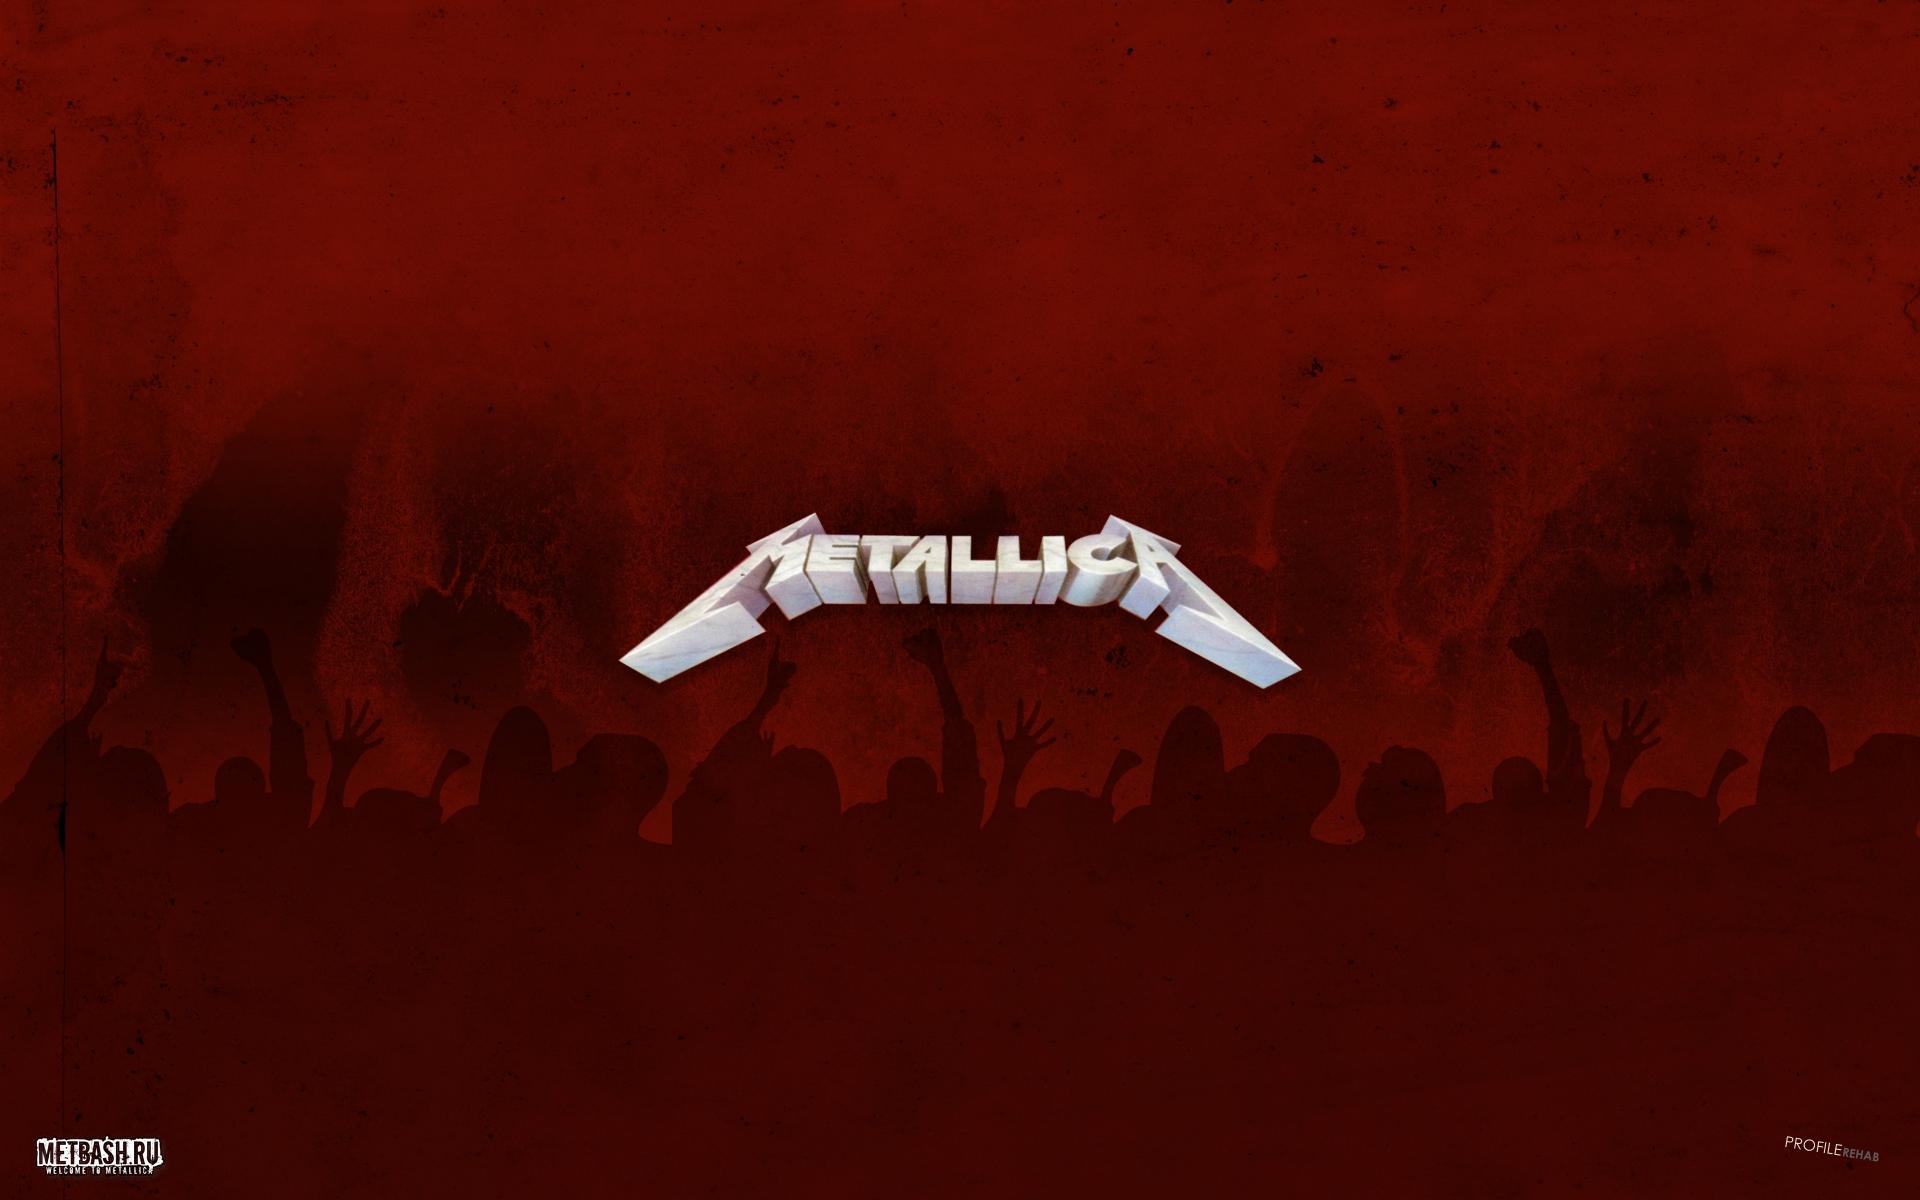 Metallica Logo wallpaper 1920x1200